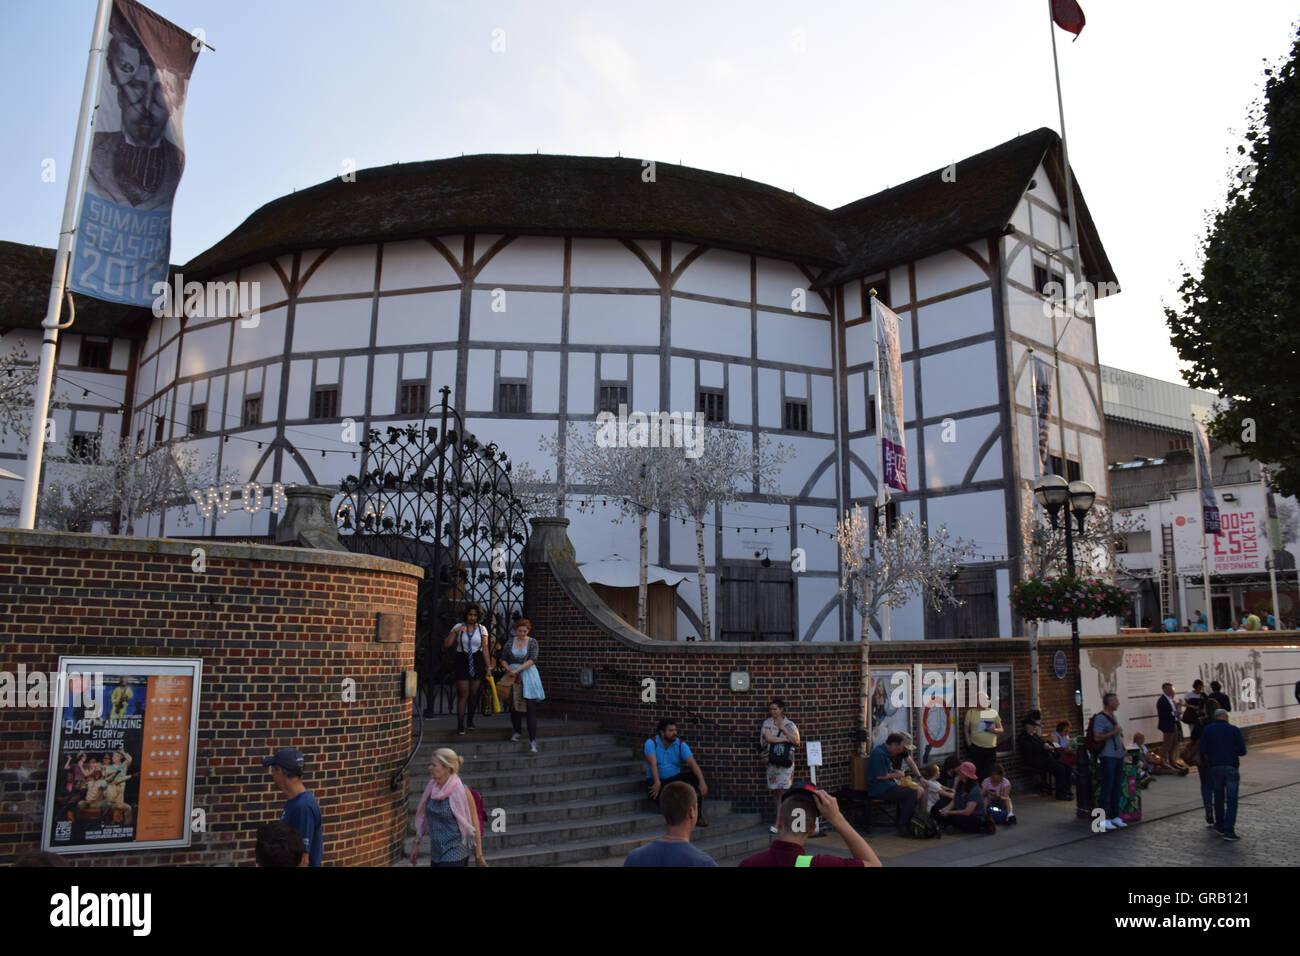 Shakespeare's Globe, Bankside, London UK - Stock Image